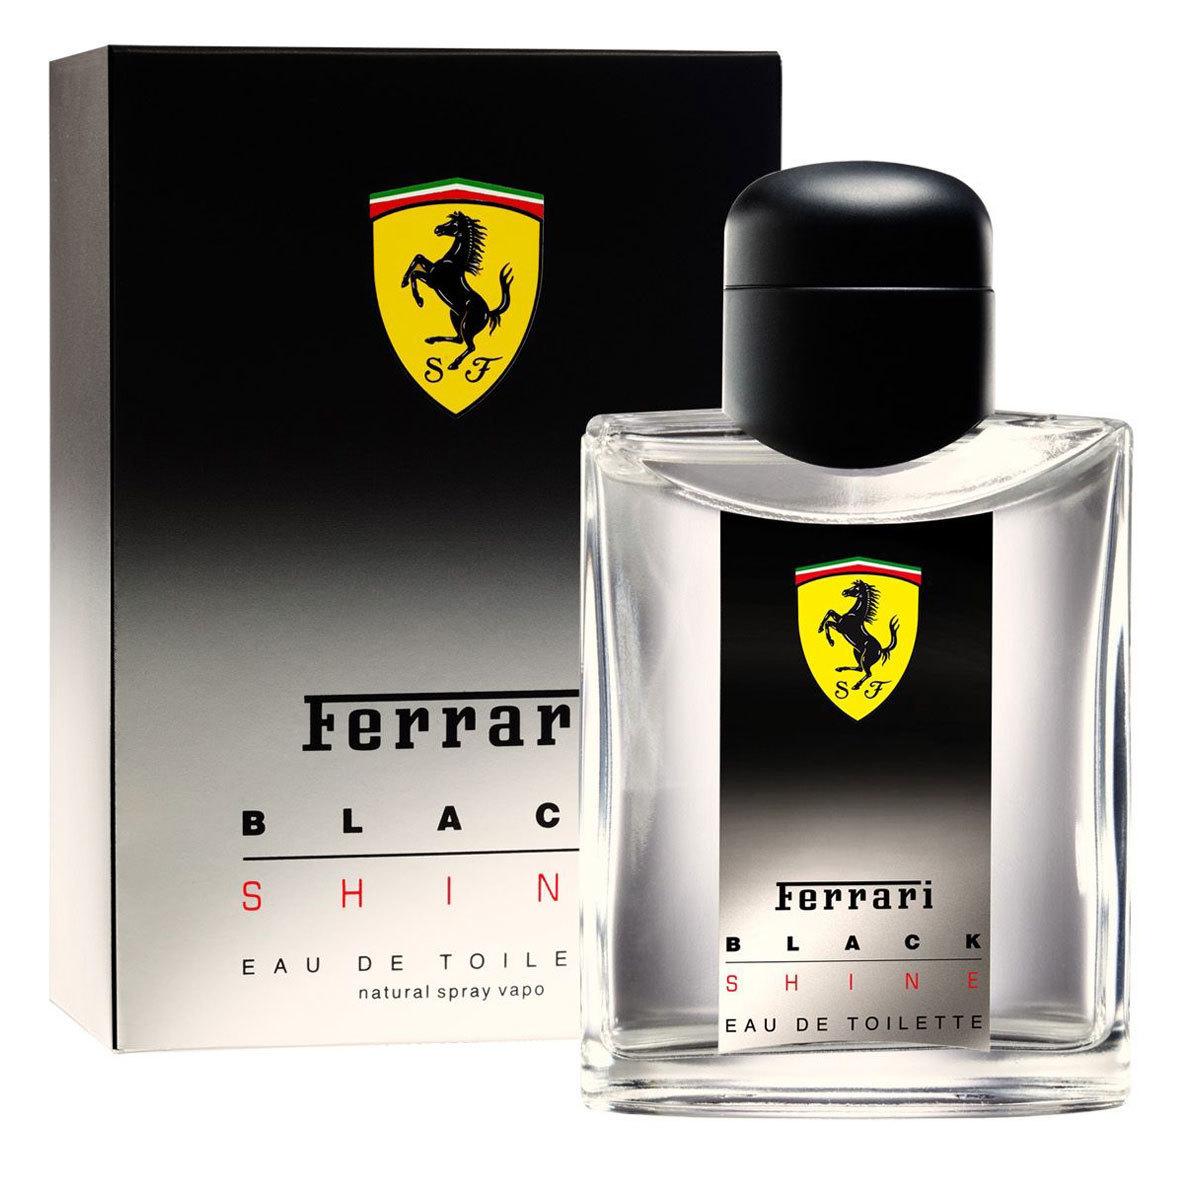 Ferrari Black Shine Eau De Toilette for Men 125ml